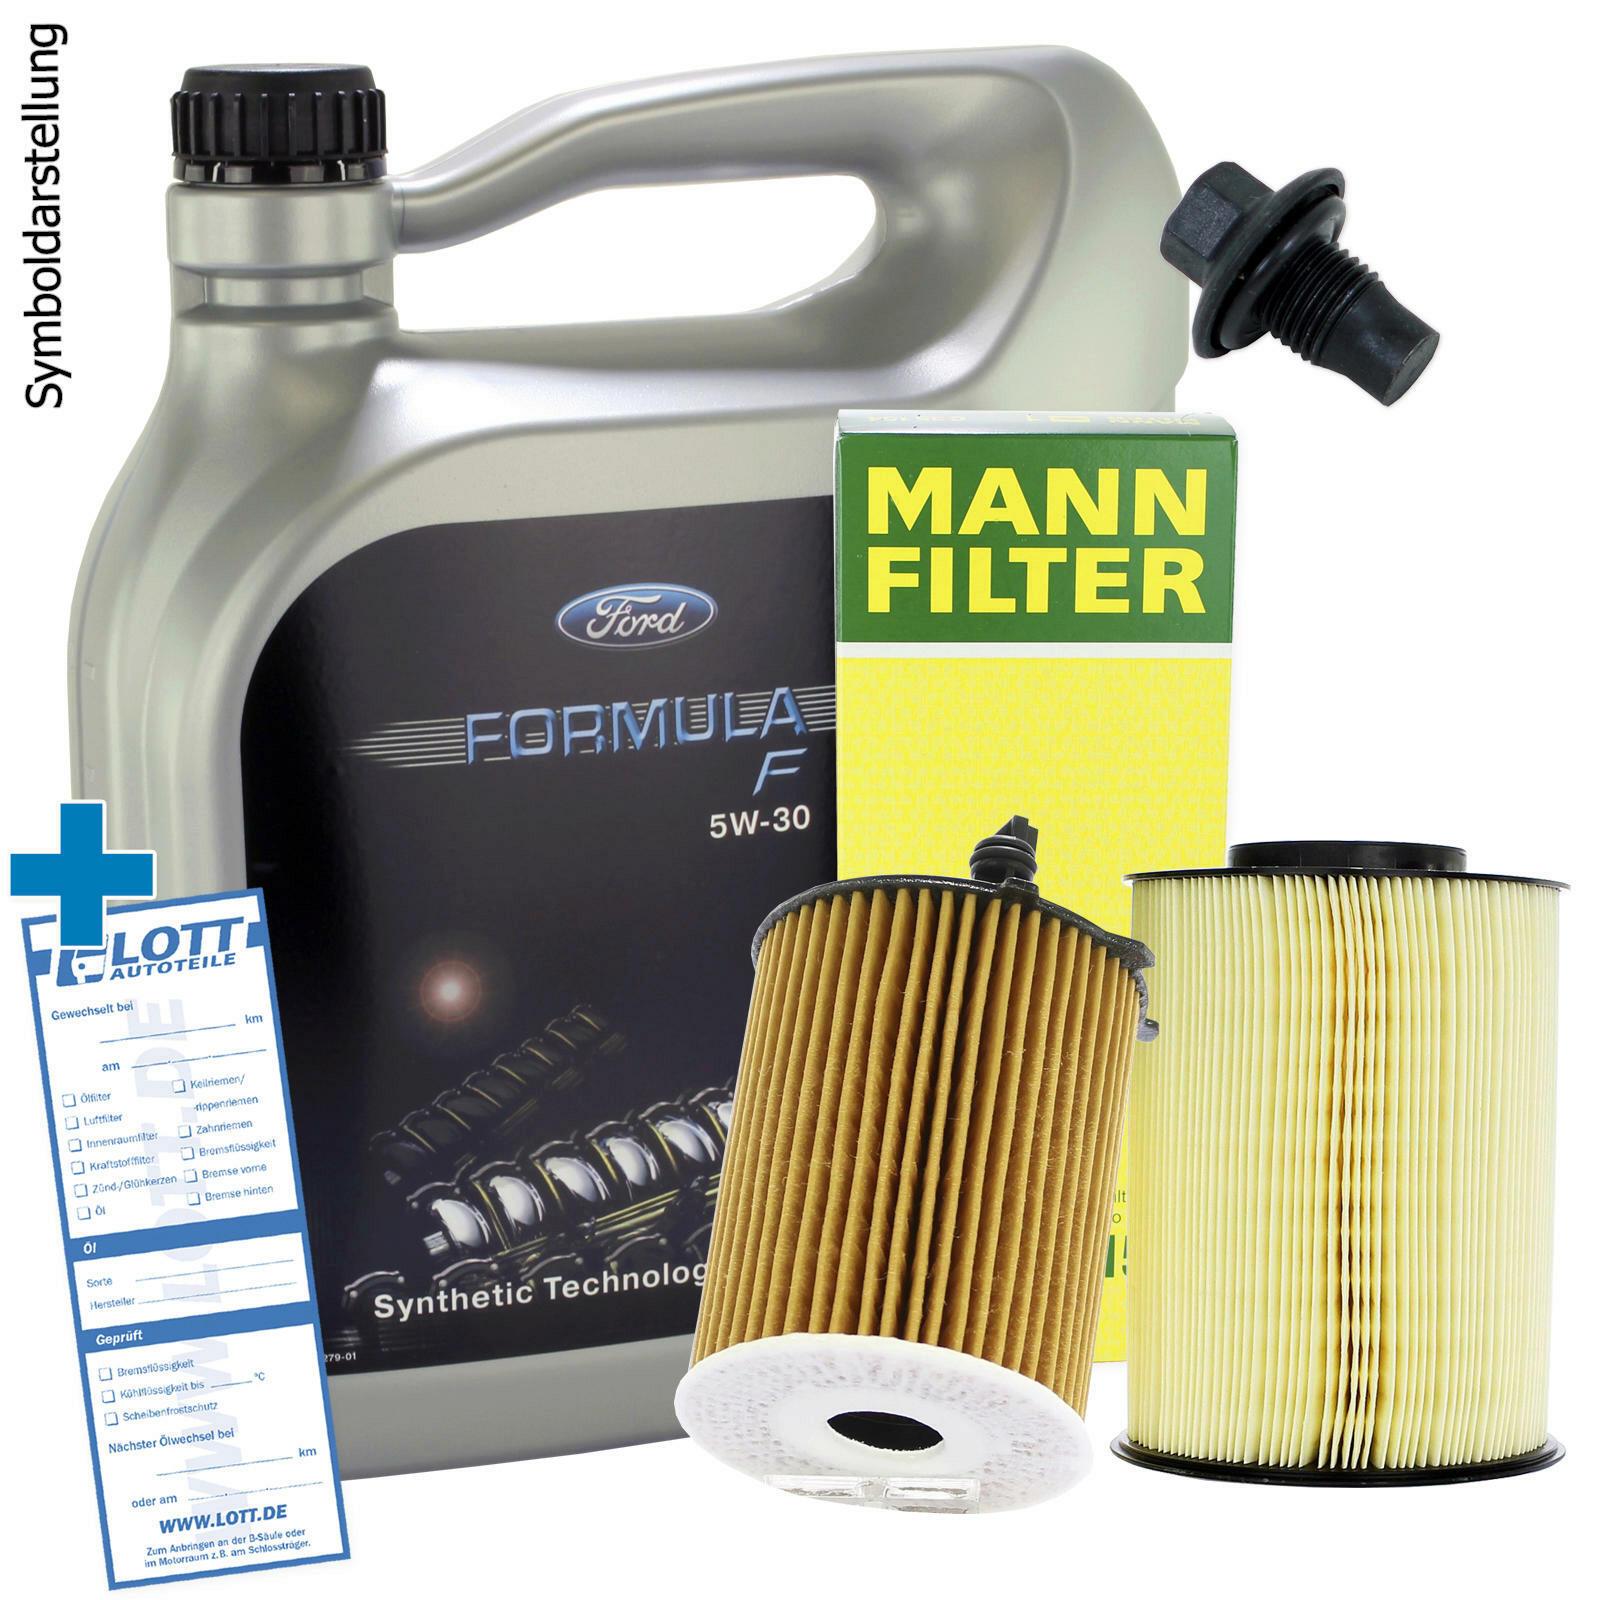 Ford Motoröl + Ölfilter + Luftfilter + Ablassschraube